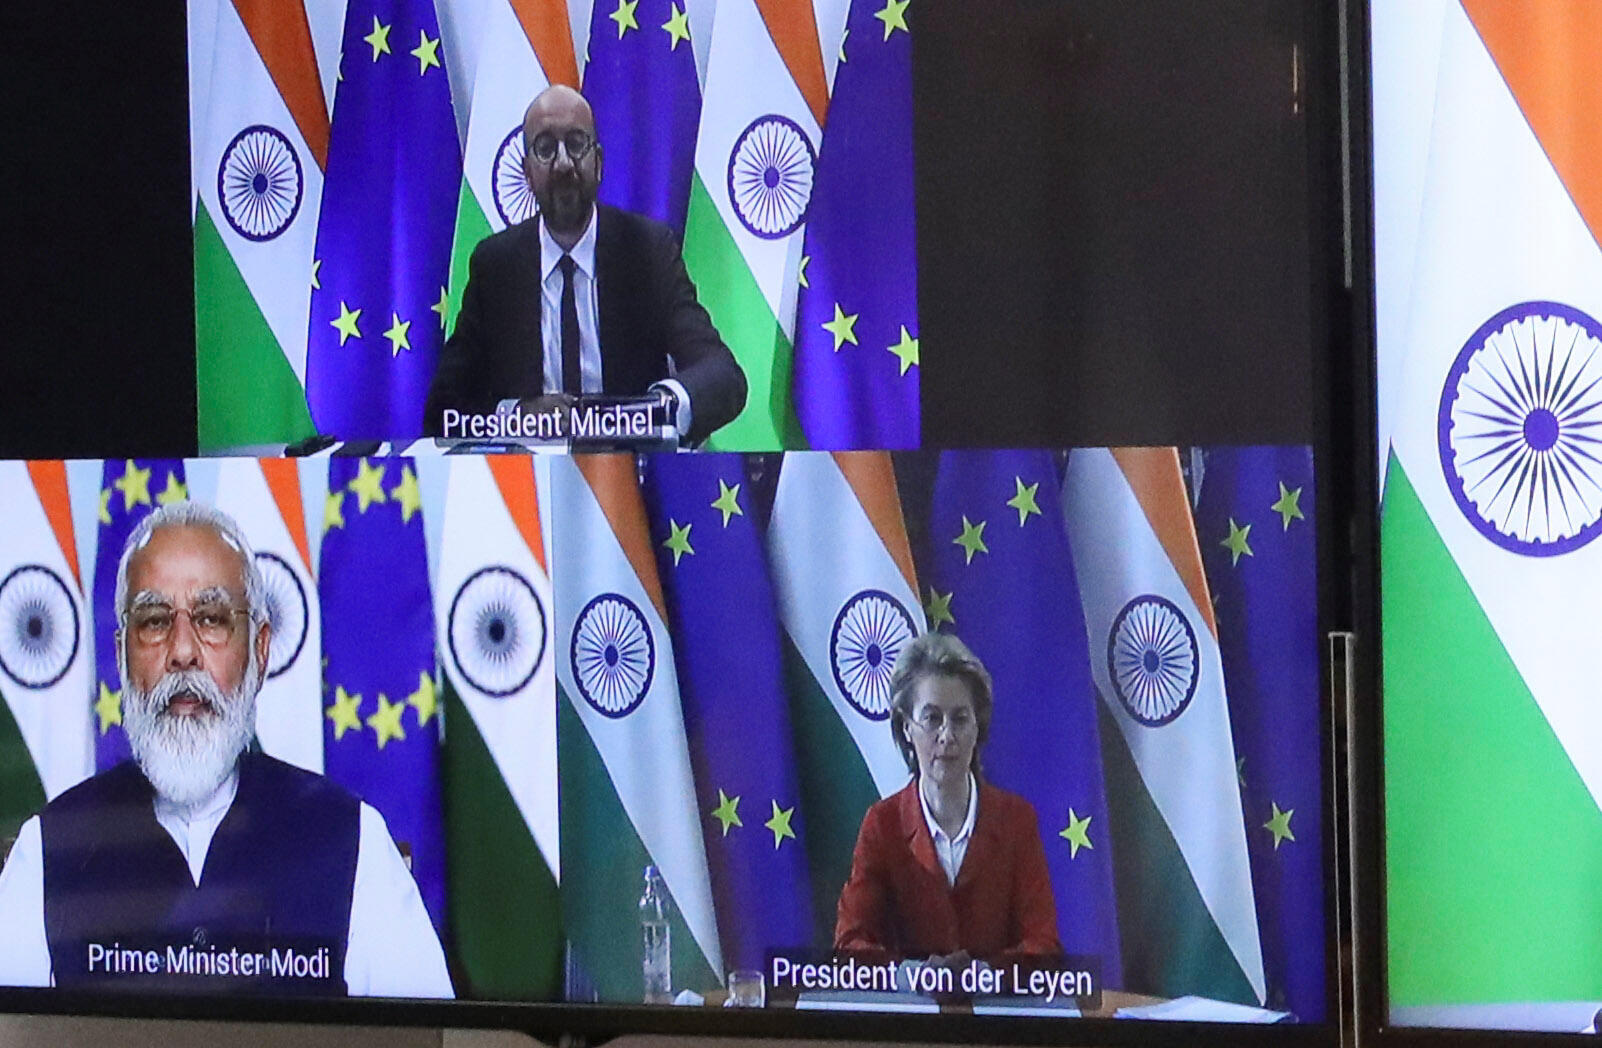 2020-07-15T114119Z_535449463_RC2NTH9LQ4VO_RTRMADP_3_EU-INDIA